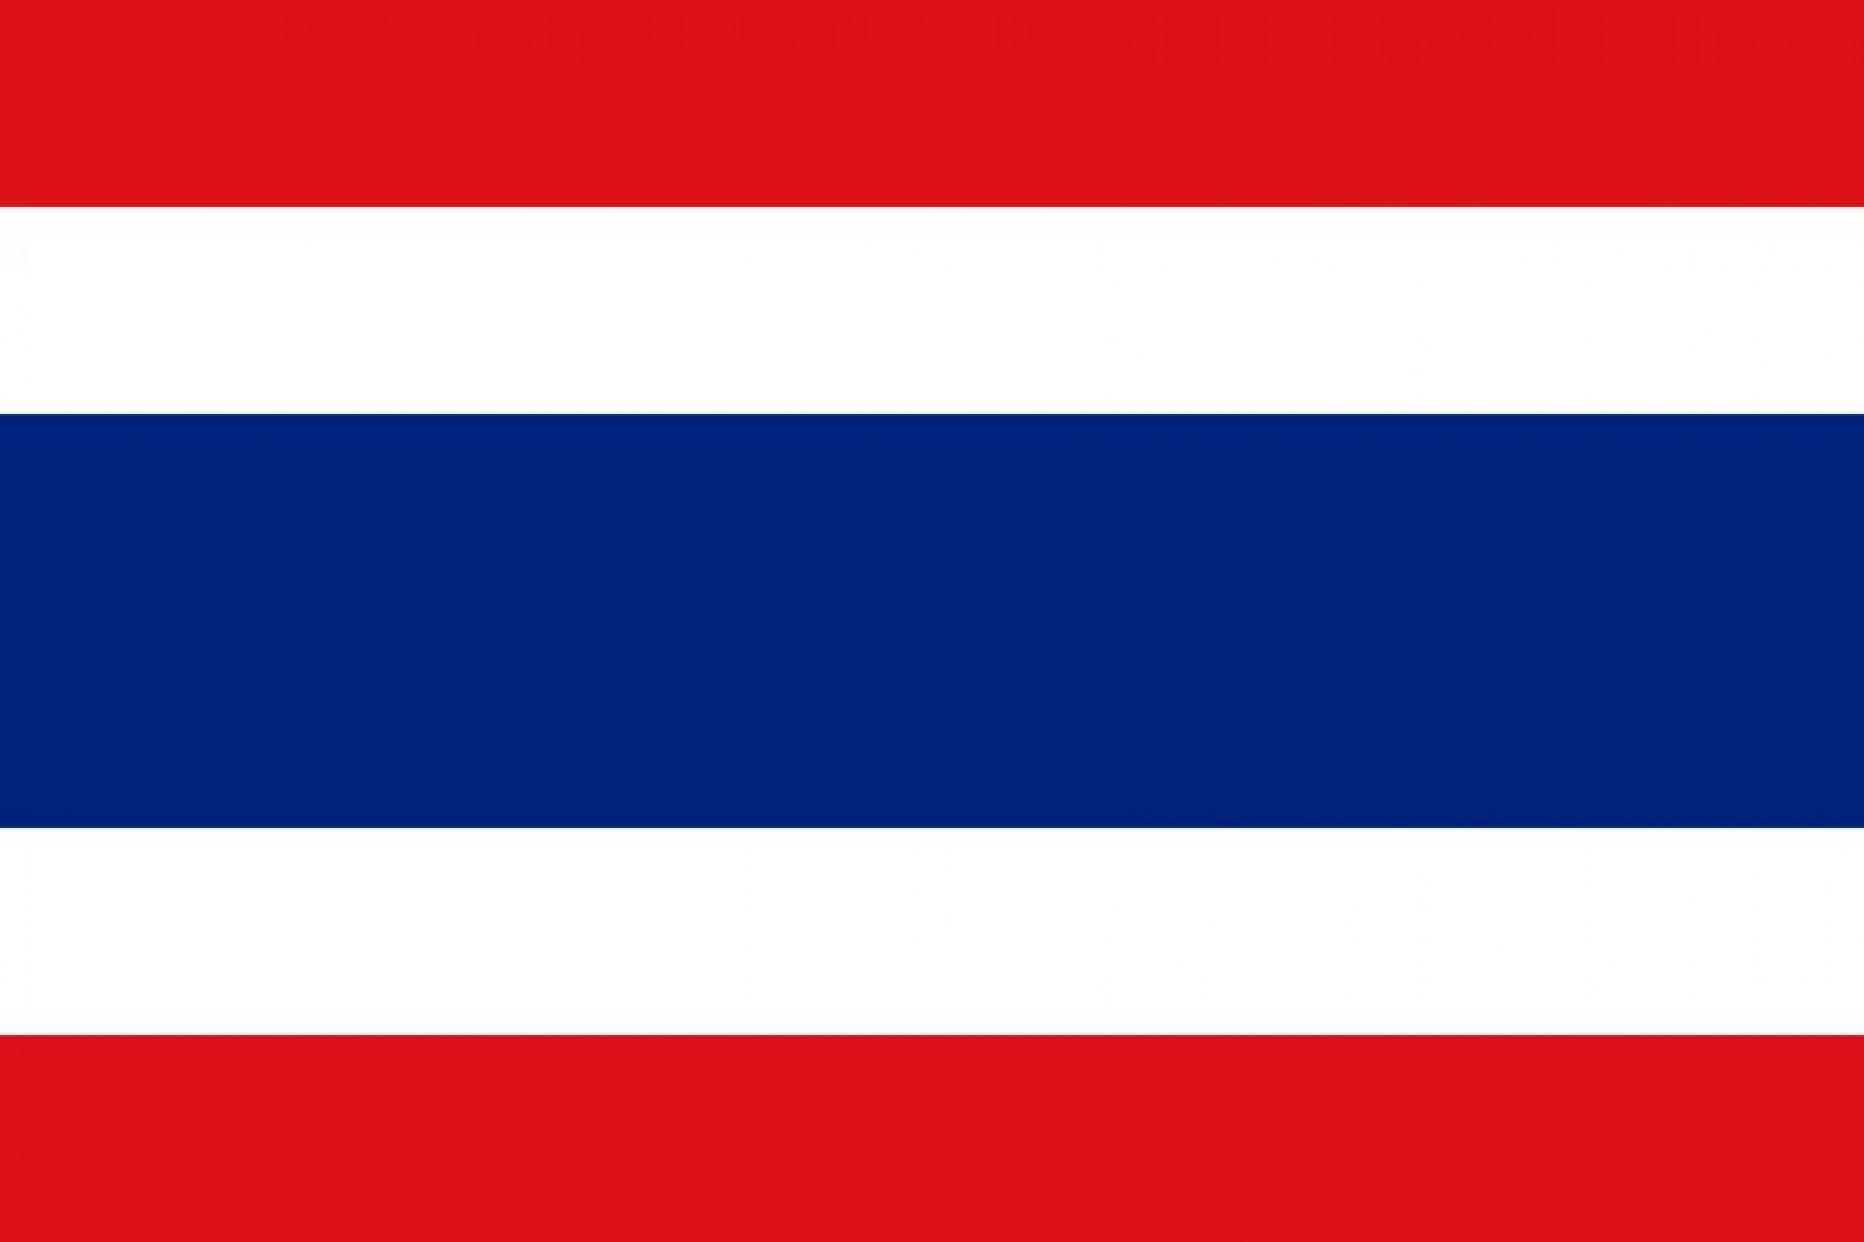 Ambassade de Thaïlande